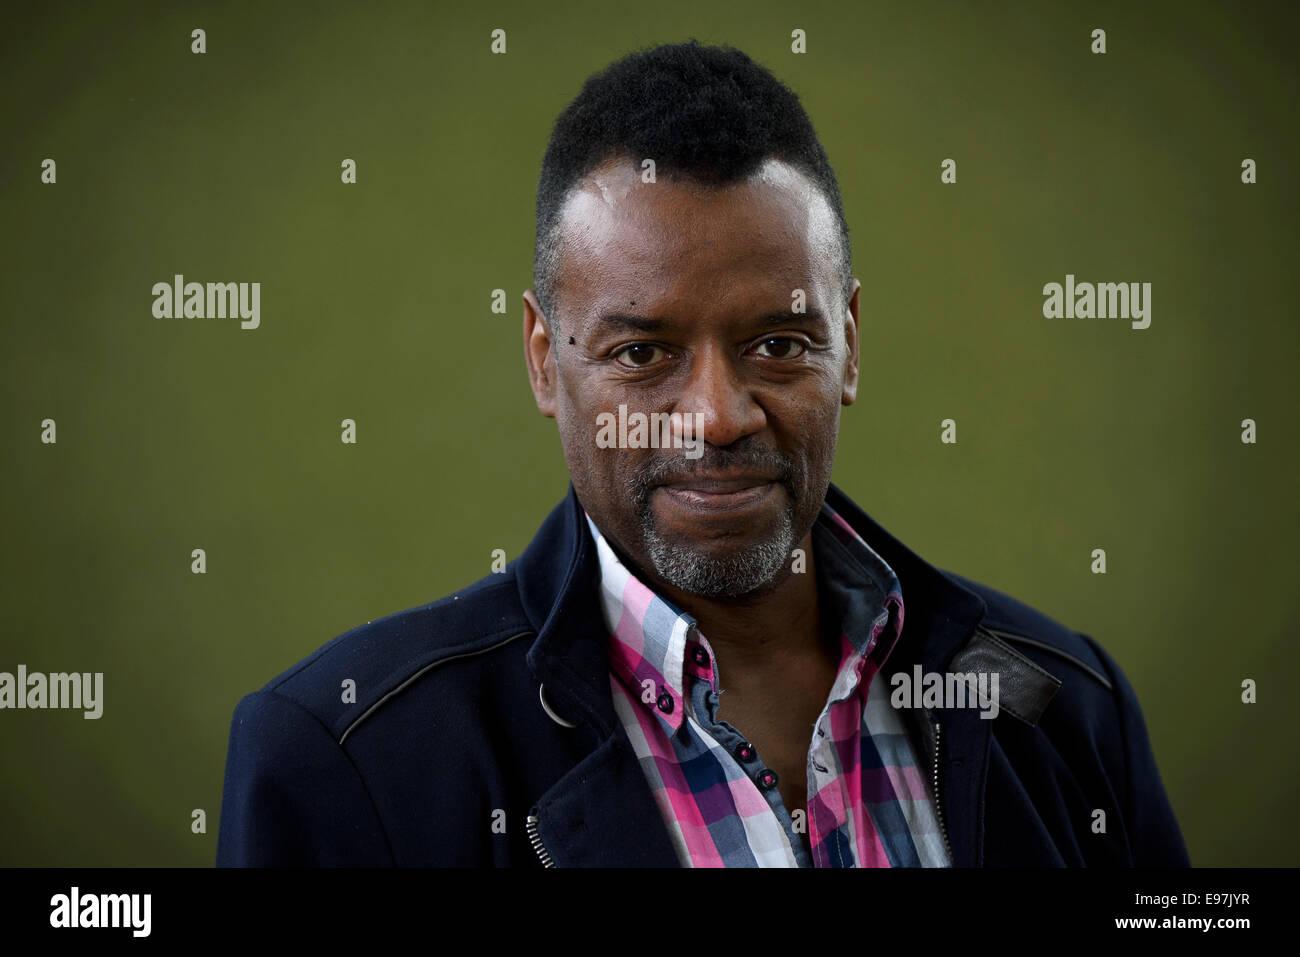 Vocal Coach, judge and TV presenter David Grant appears at the Edinburgh International Book Festival. - Stock Image